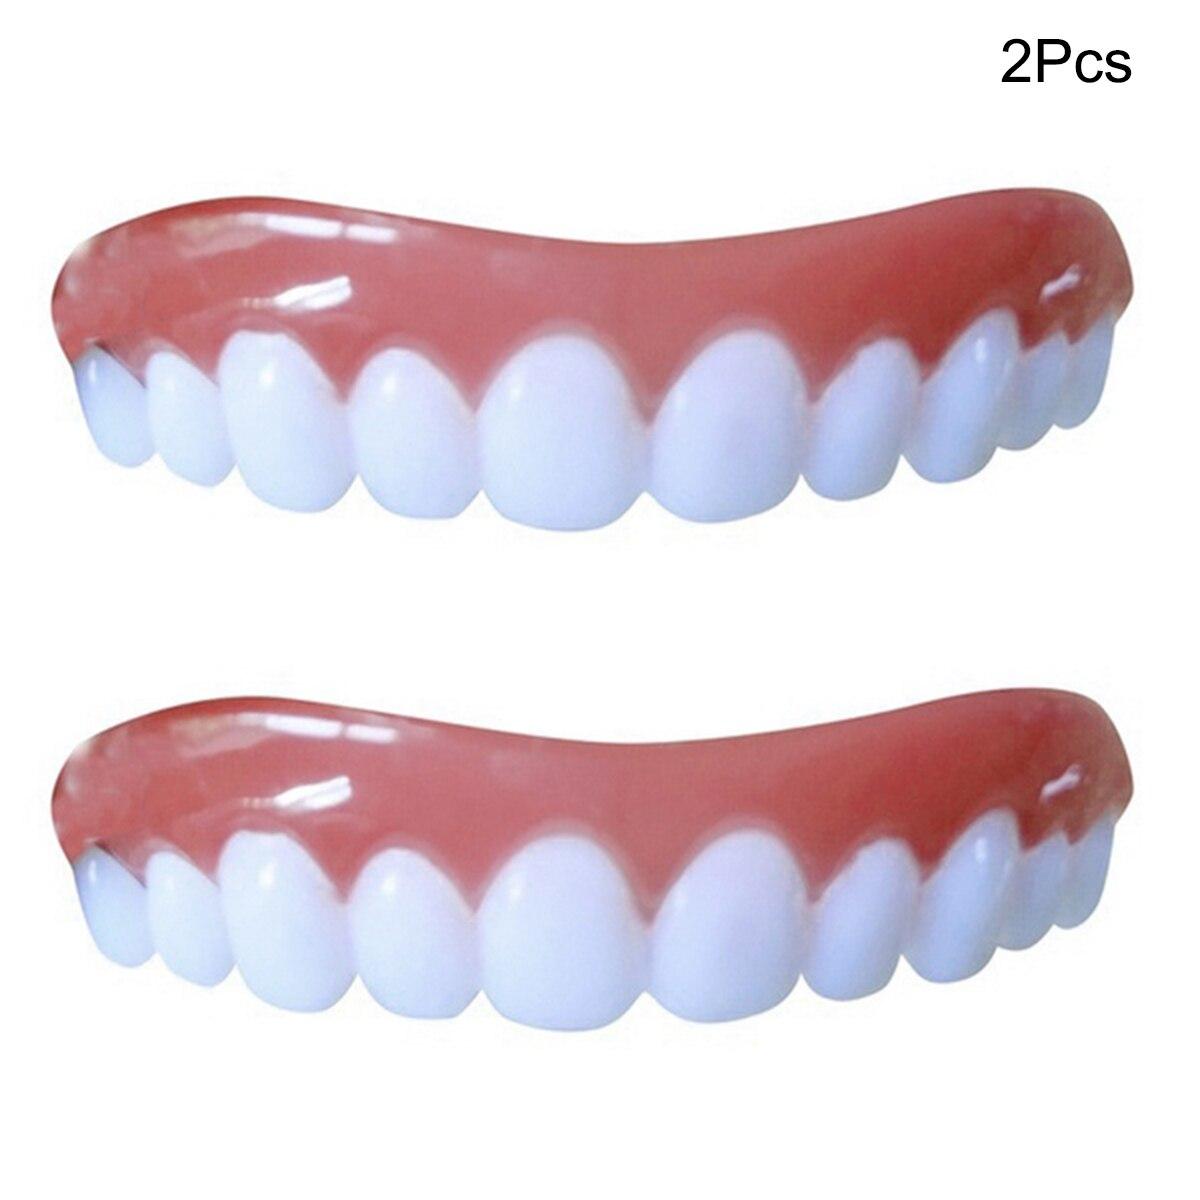 2PC Professional Perfect Smile Veneers Dub Stock Correction Teeth